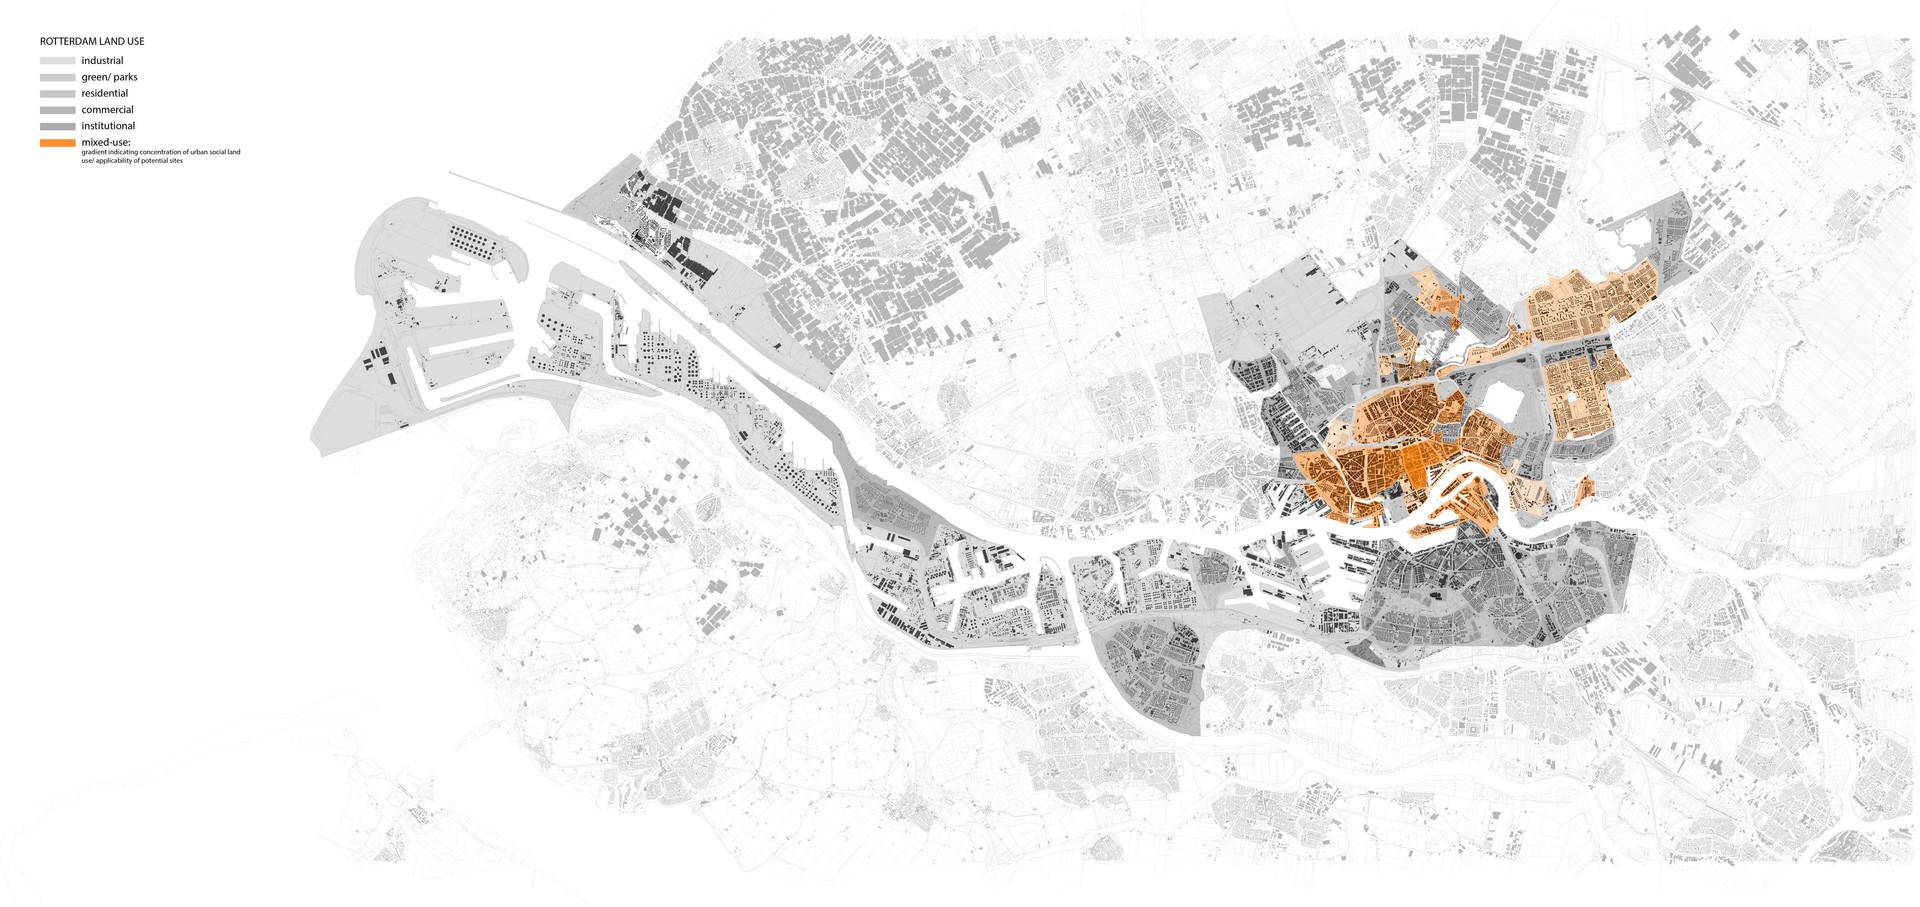 B_Moore_Map_02_Rotterdam_Landuse.jpg